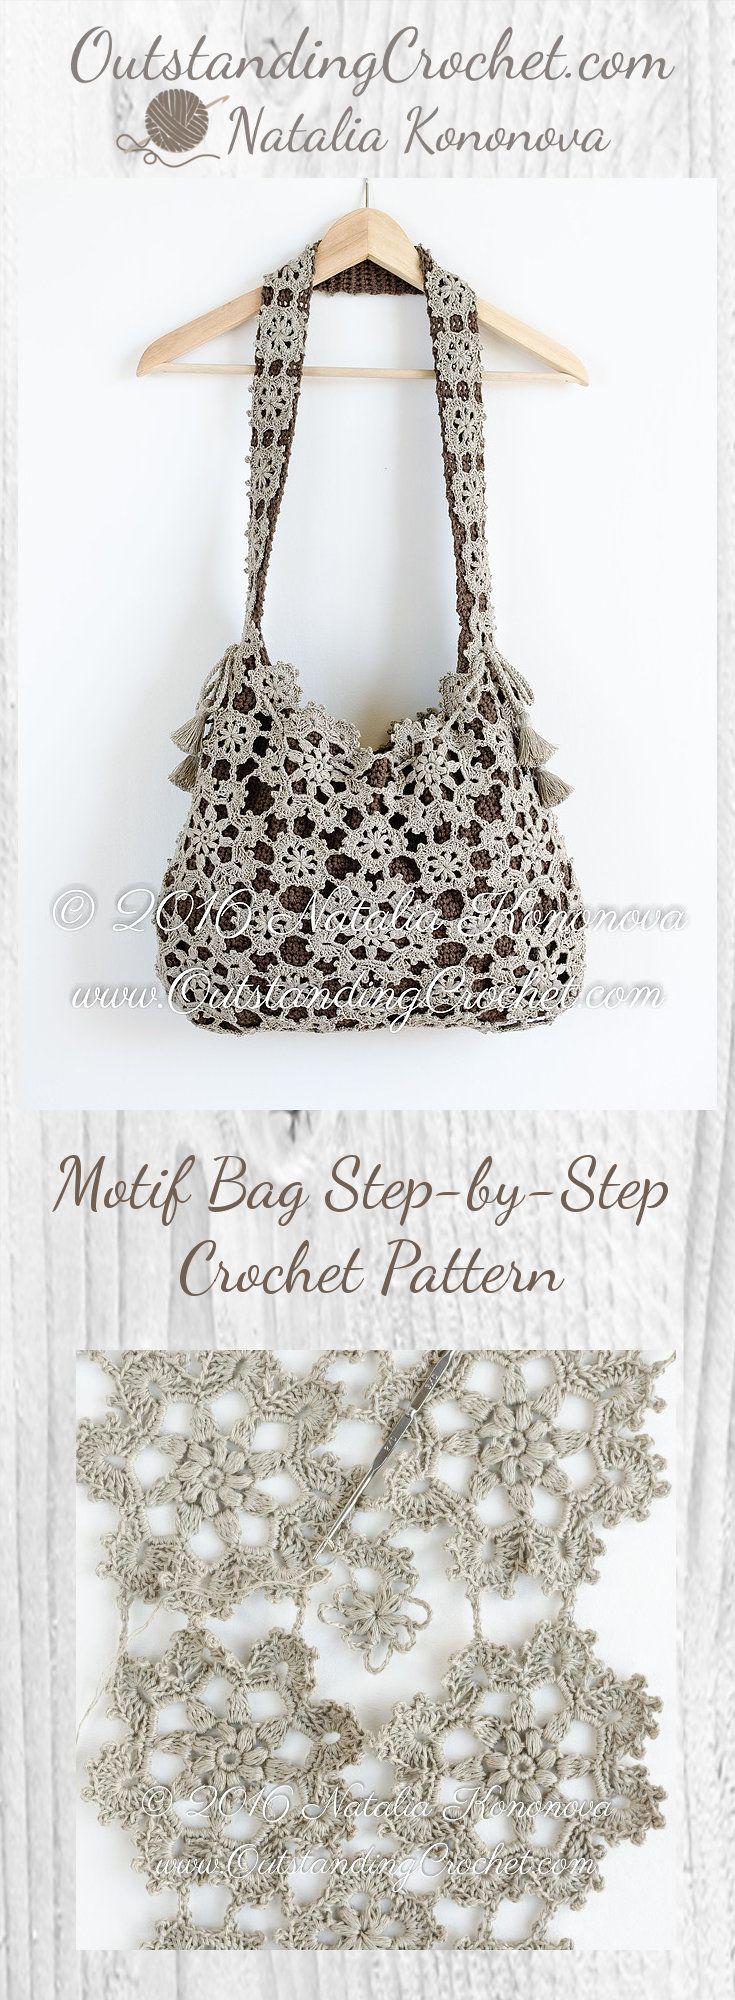 Motif Bag Step-by-Step Crochet Pattern at www.OutstandingCrochet.com ...